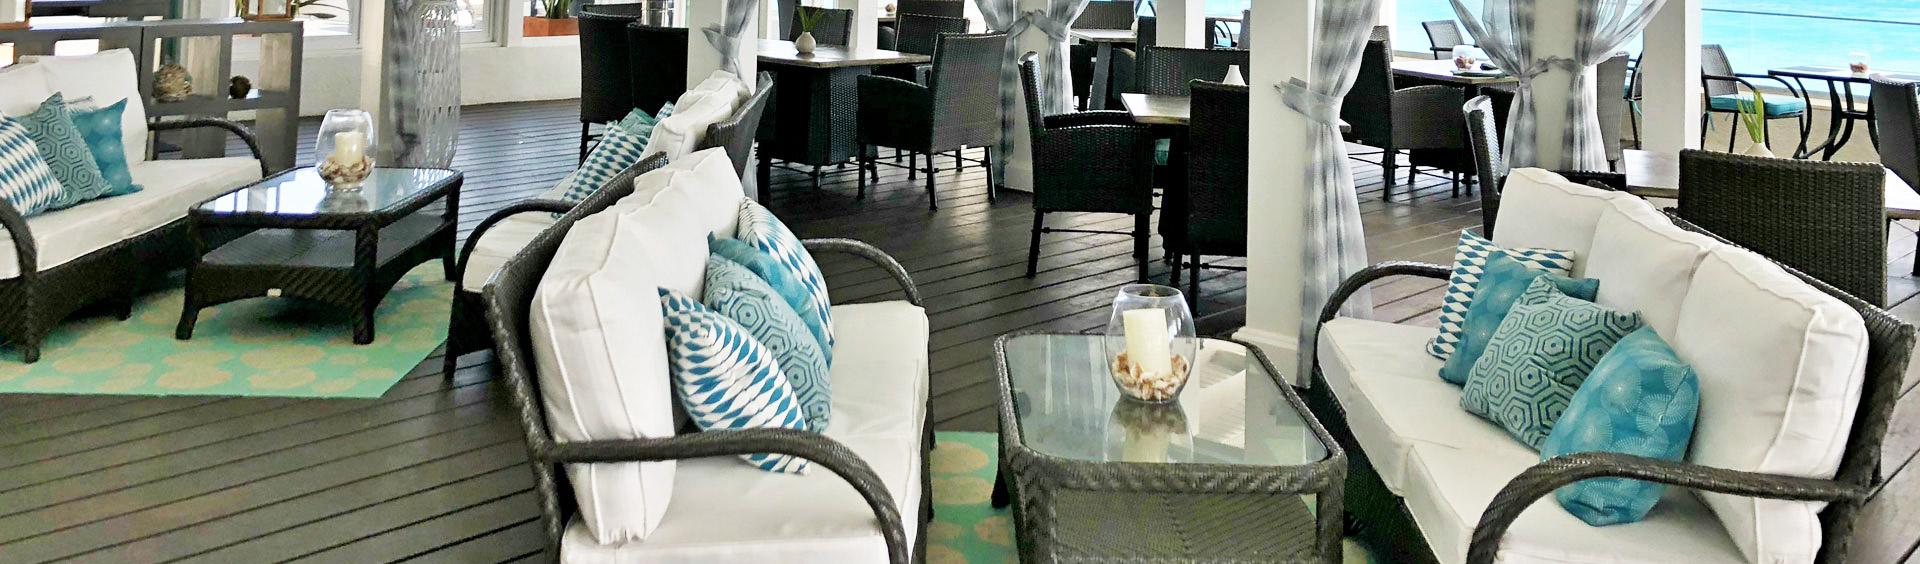 Groups Facilities at Groups South Beach Hotel, Barbados